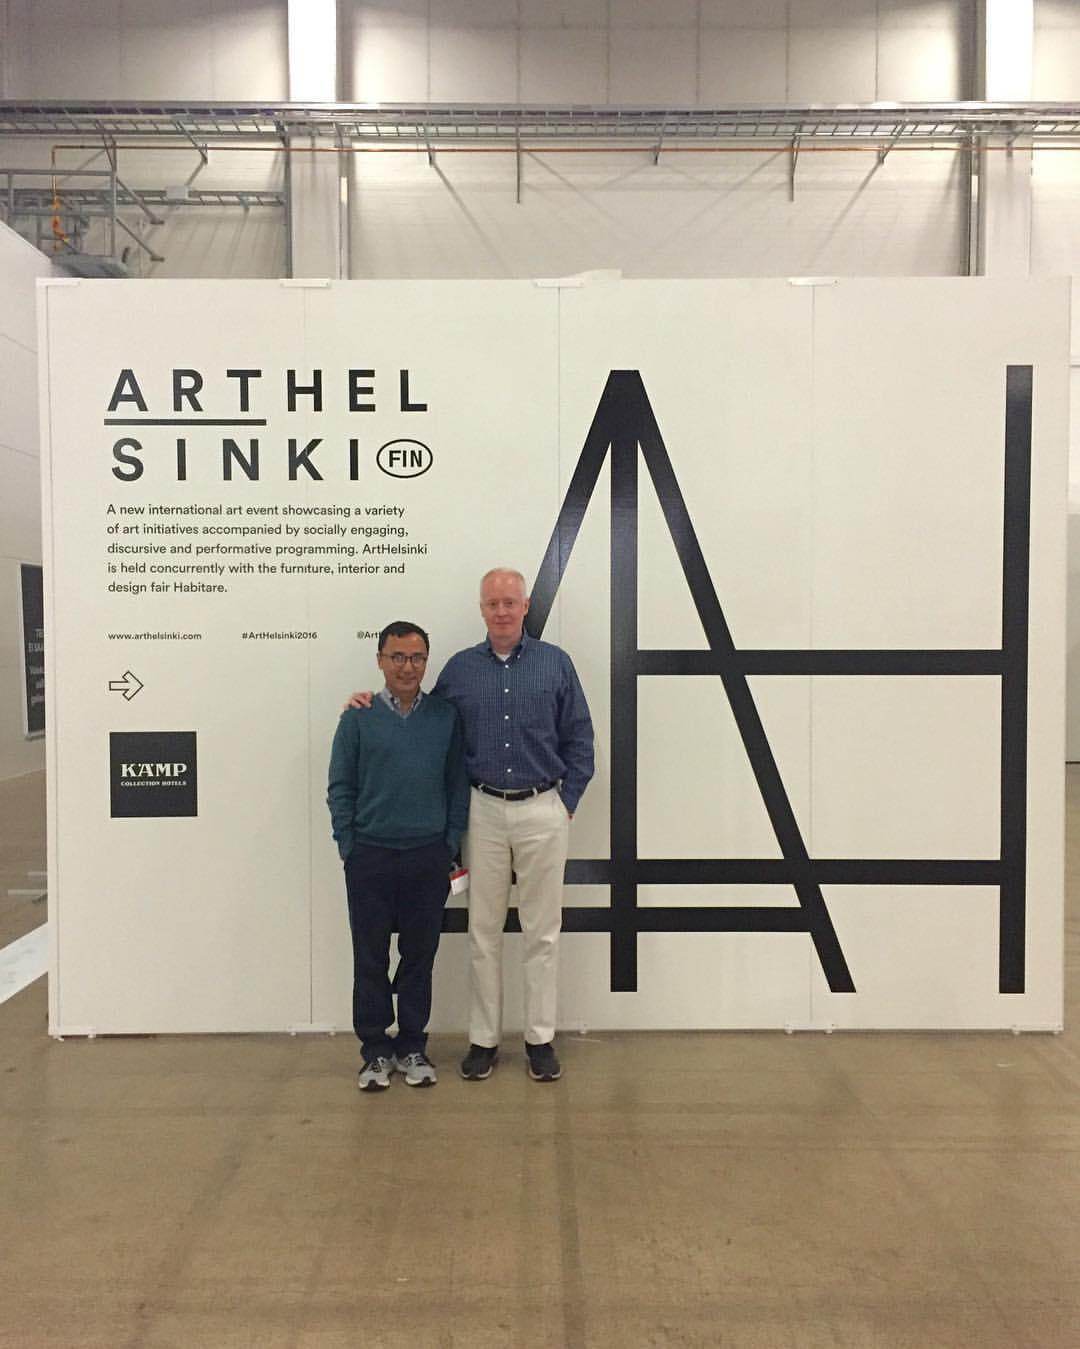 ArtHelsinki + Moving image + NIIO